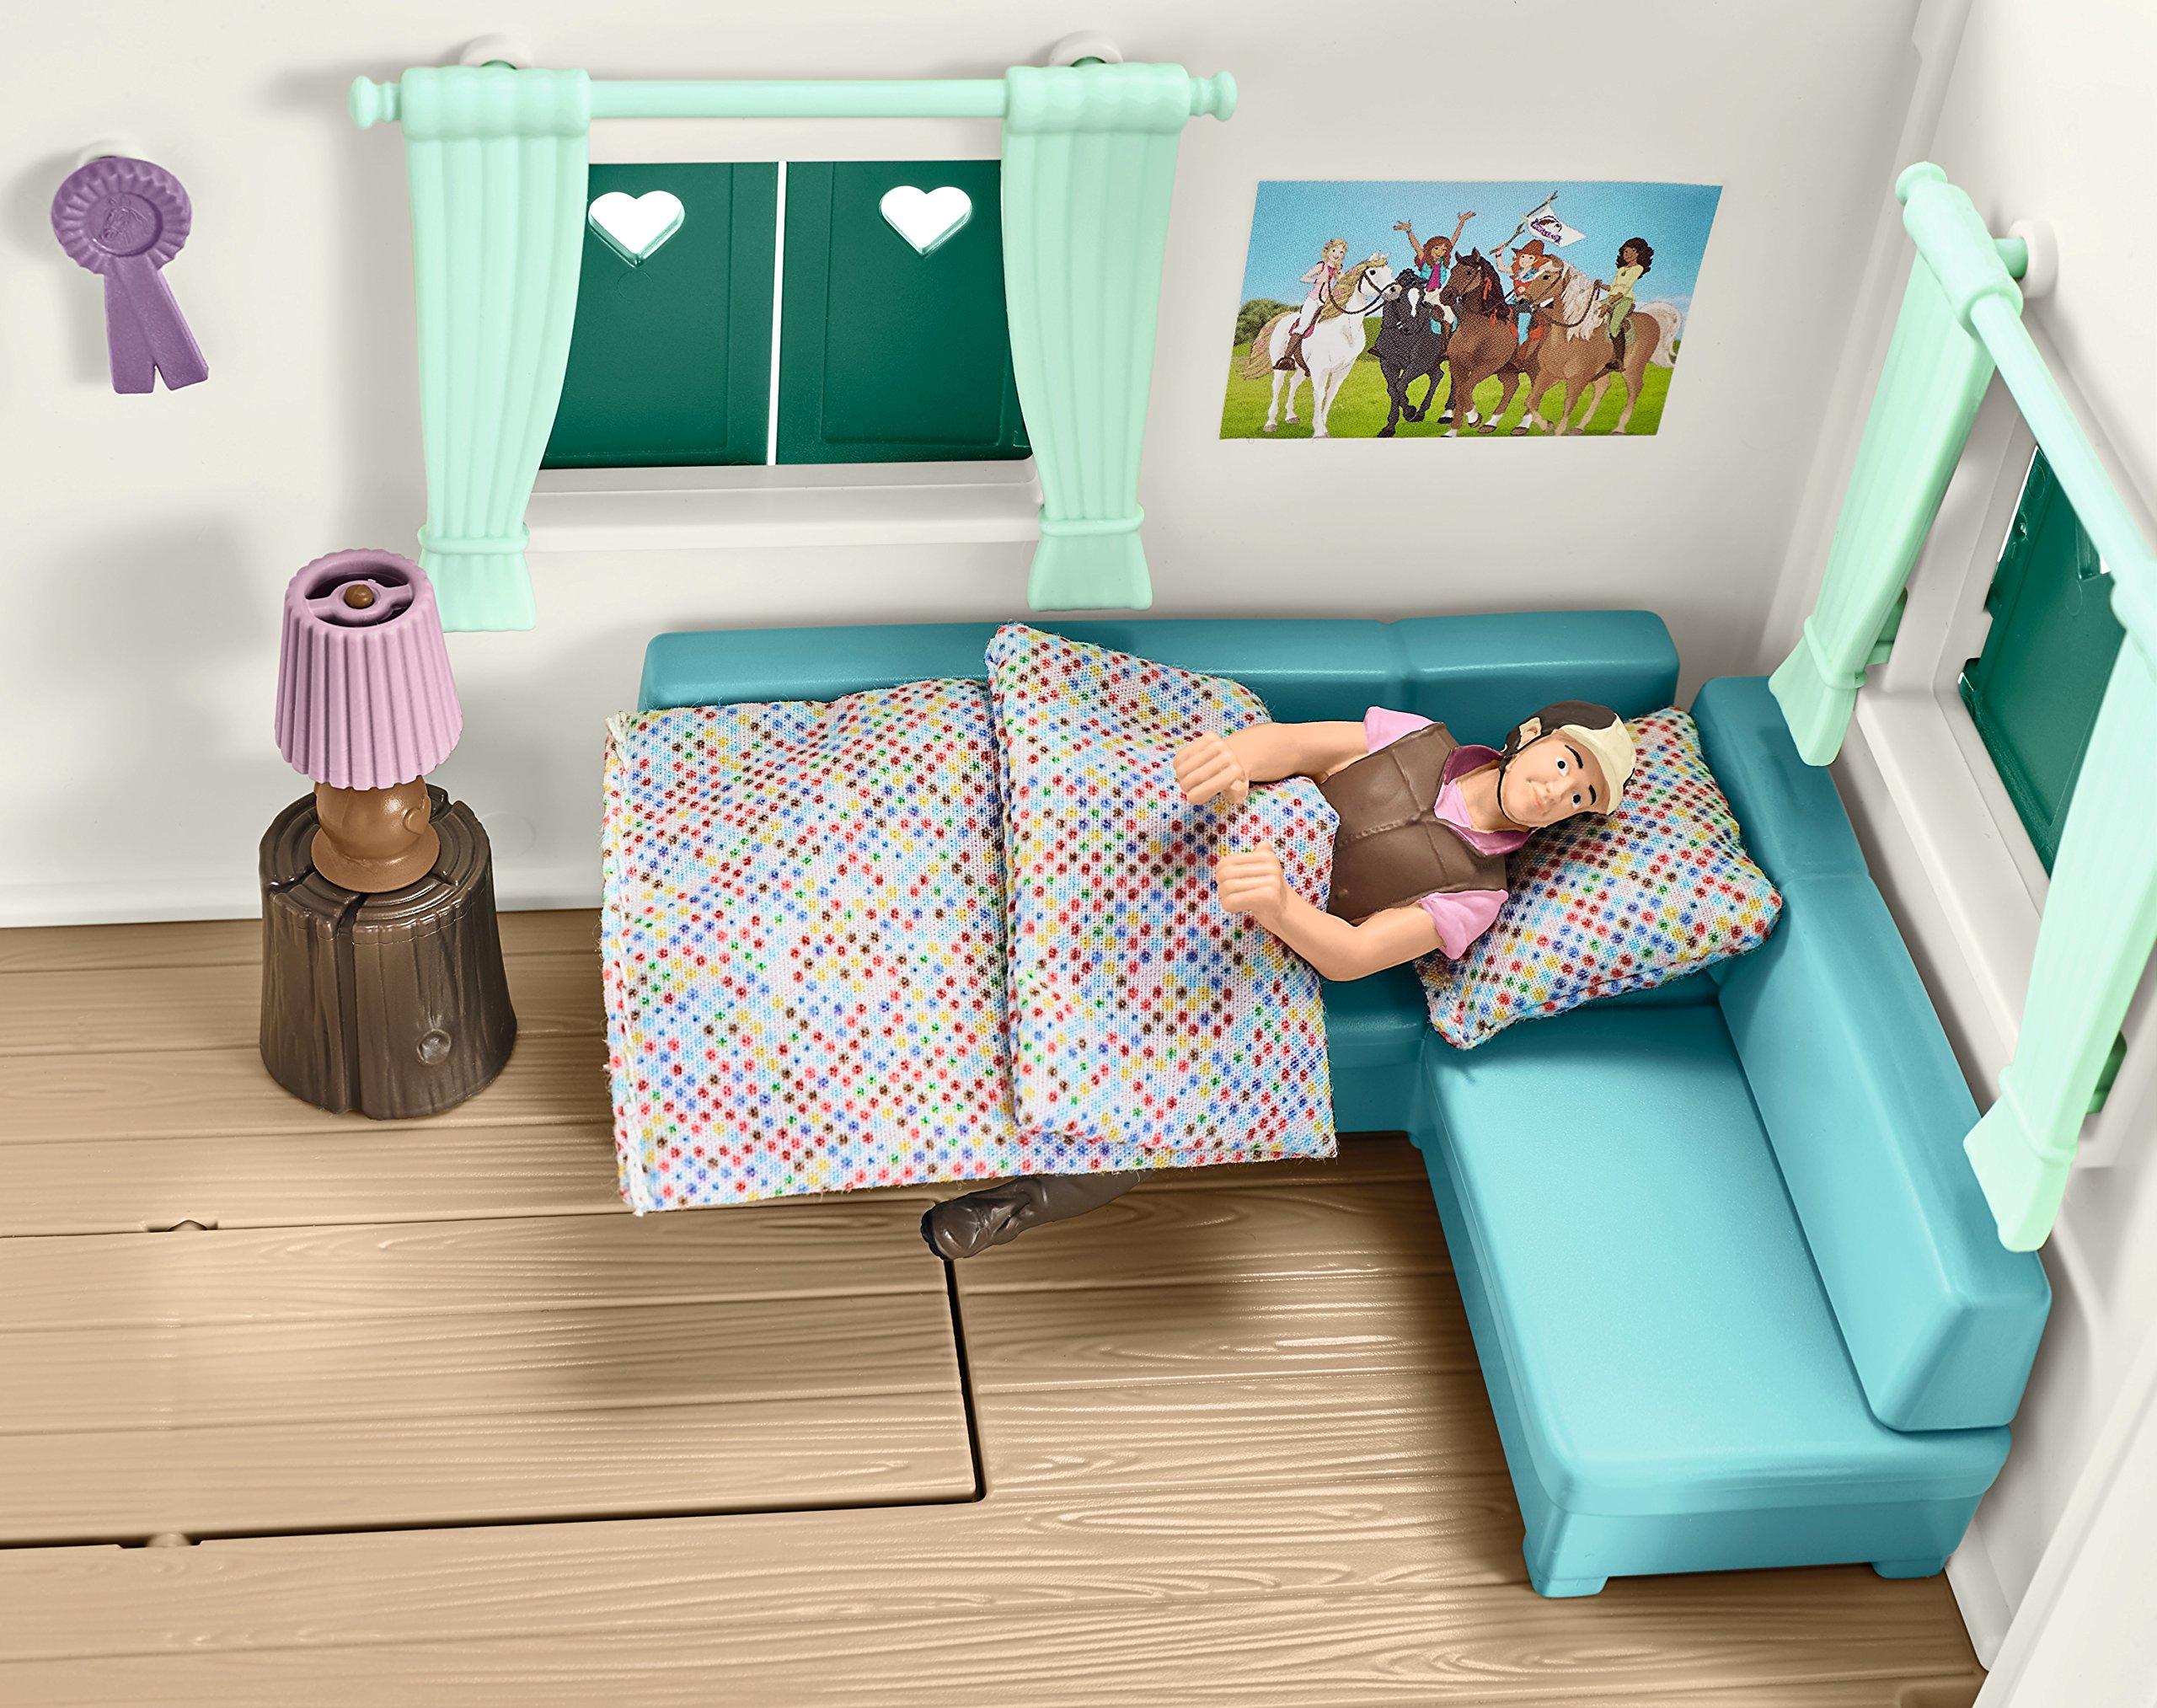 Schleich 42415 Caravan for Secret Club Meetings Play Set, Multicolor by Schleich (Image #6)